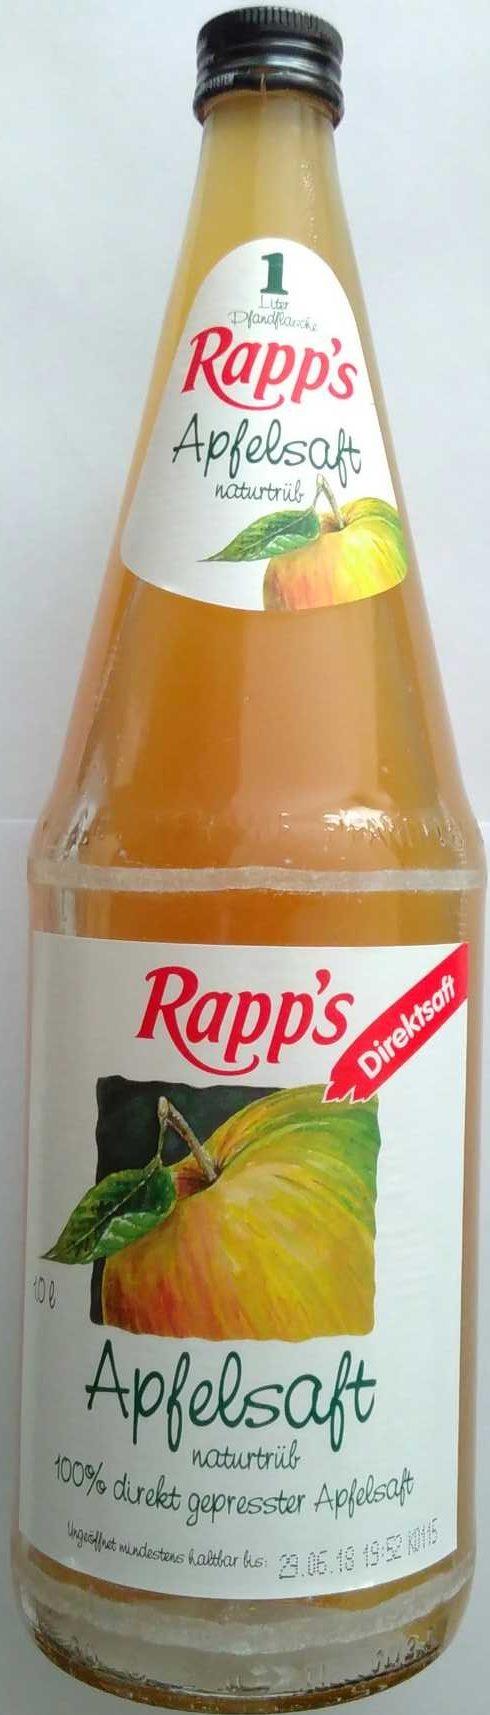 Apfelsaft naturtrüb — Rapp\'s — 1 l